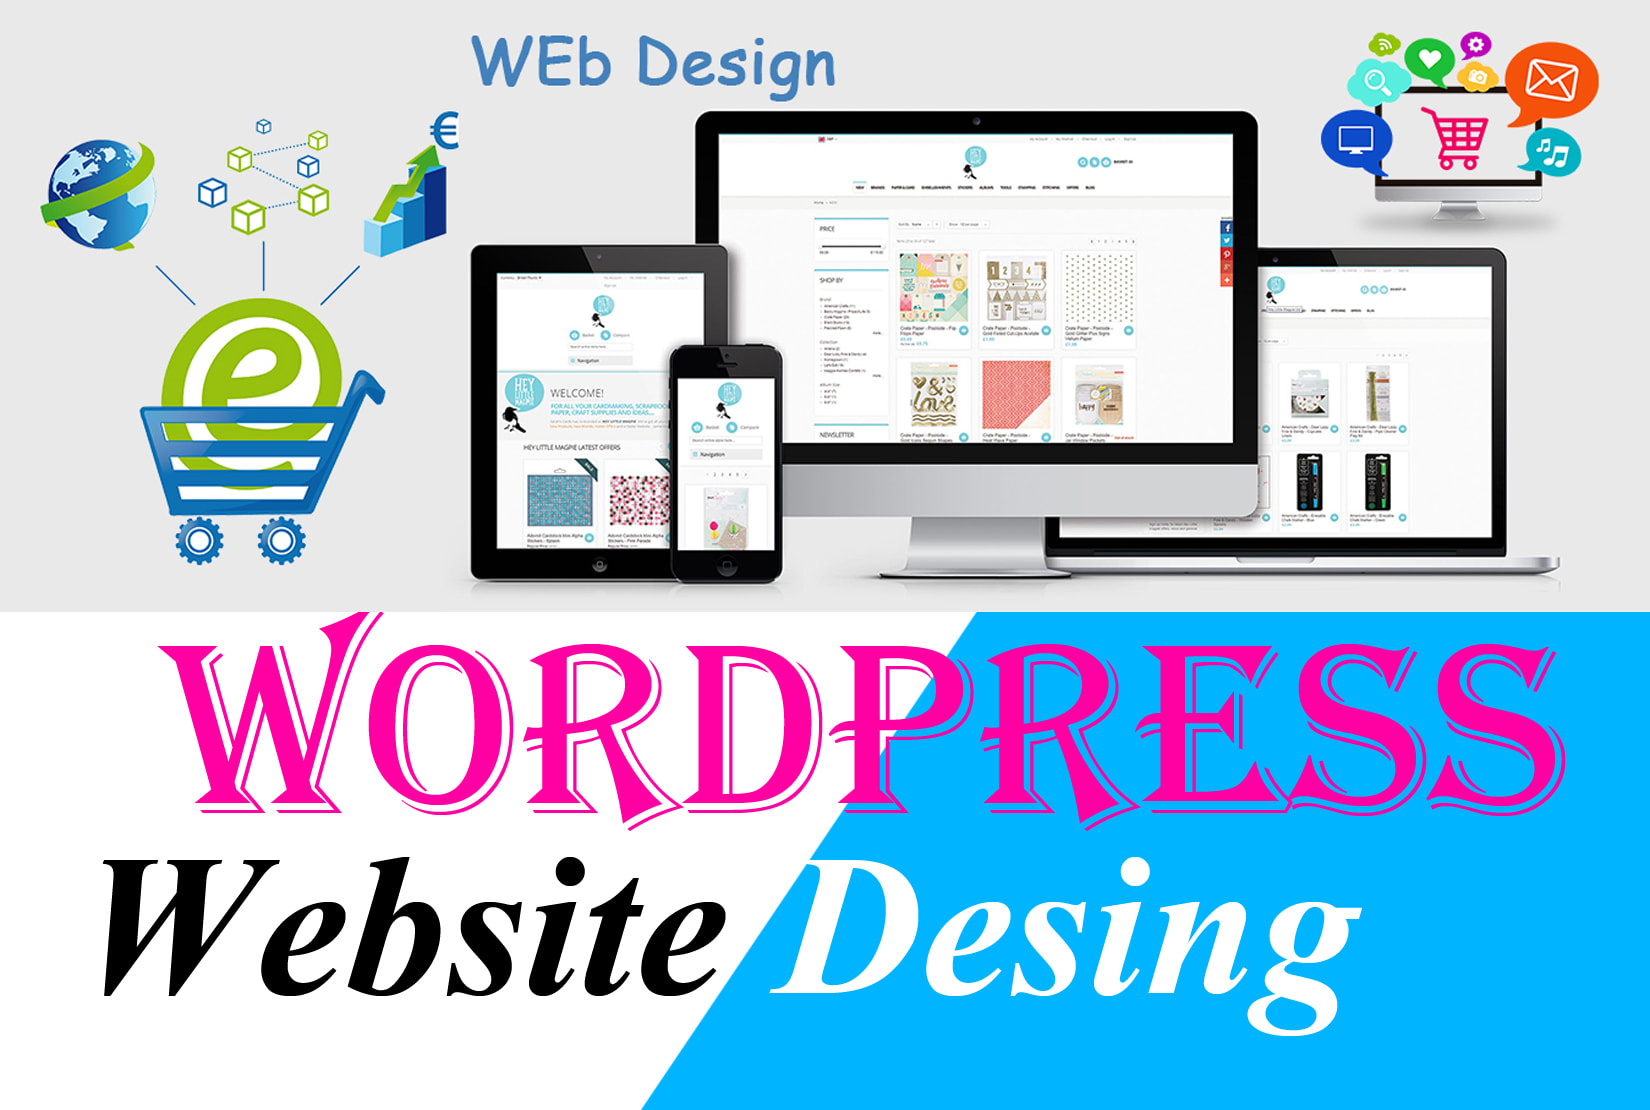 Design,  develop,  responsive,  fast,  SEO friendly wordpress website